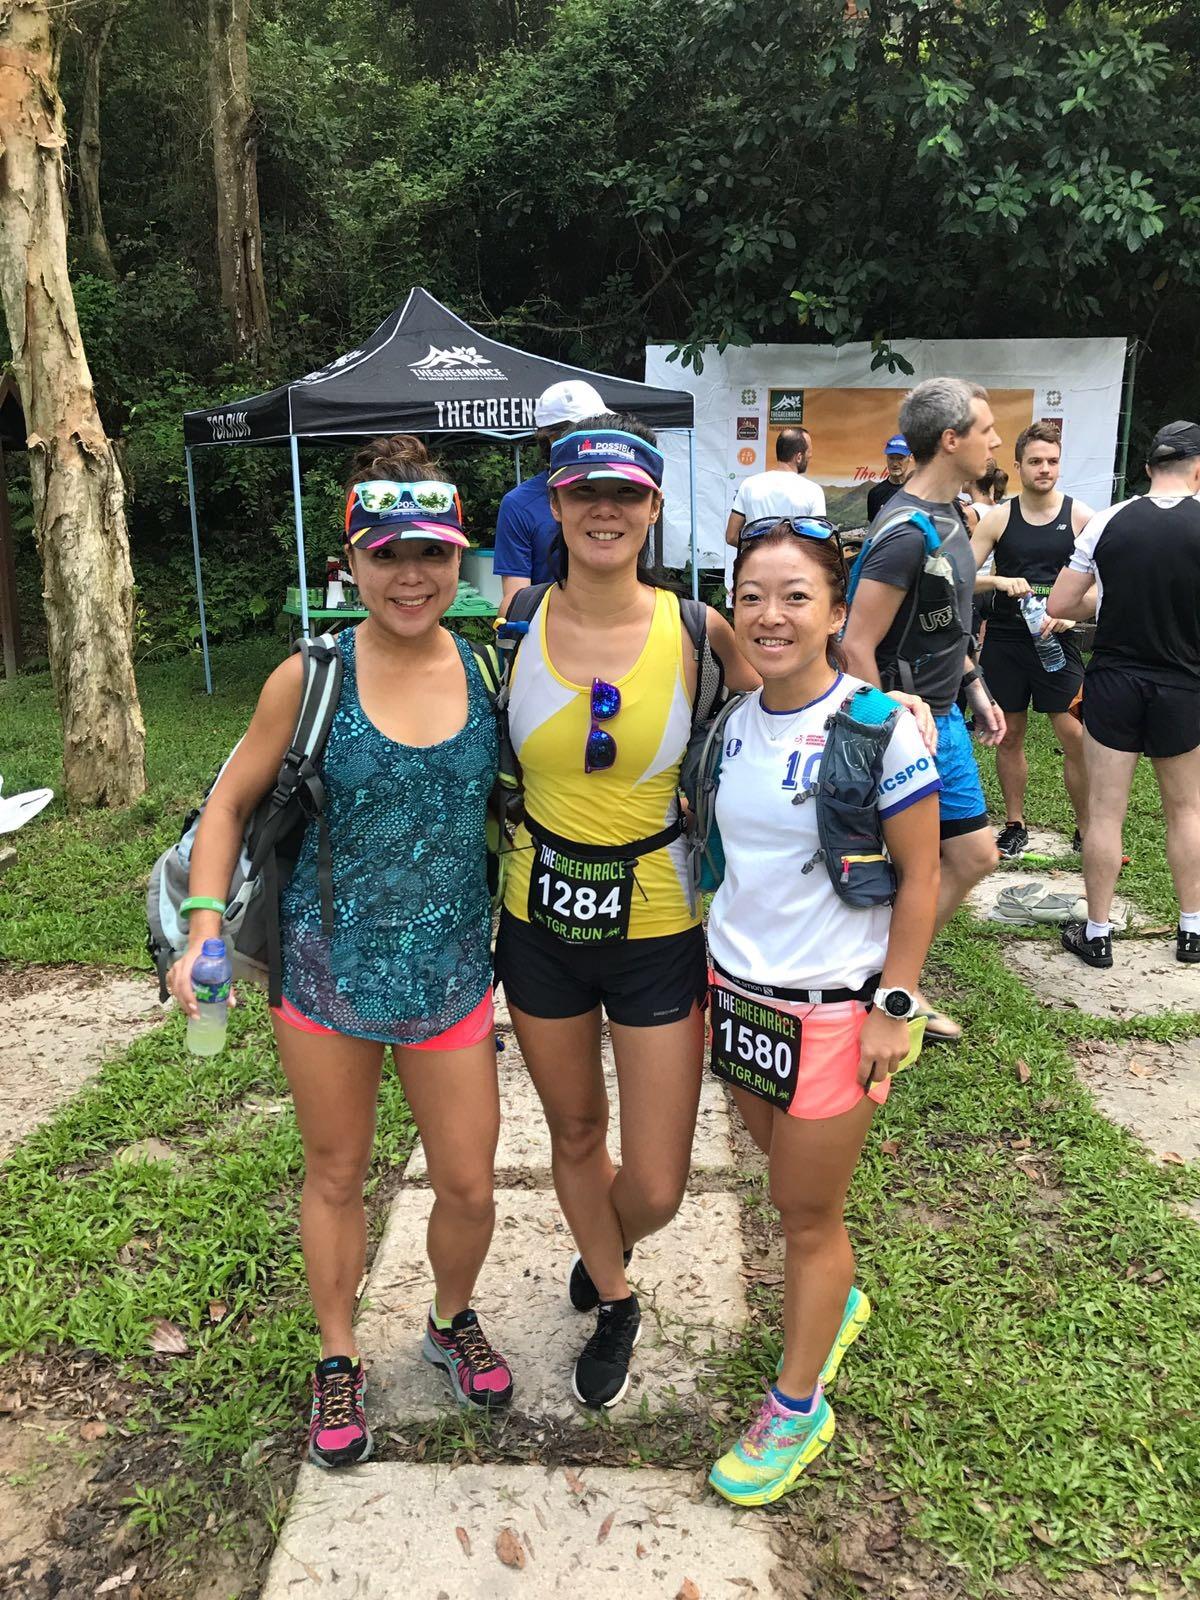 Josie farewell race is 30k mountain marathon with Janice and Gigi